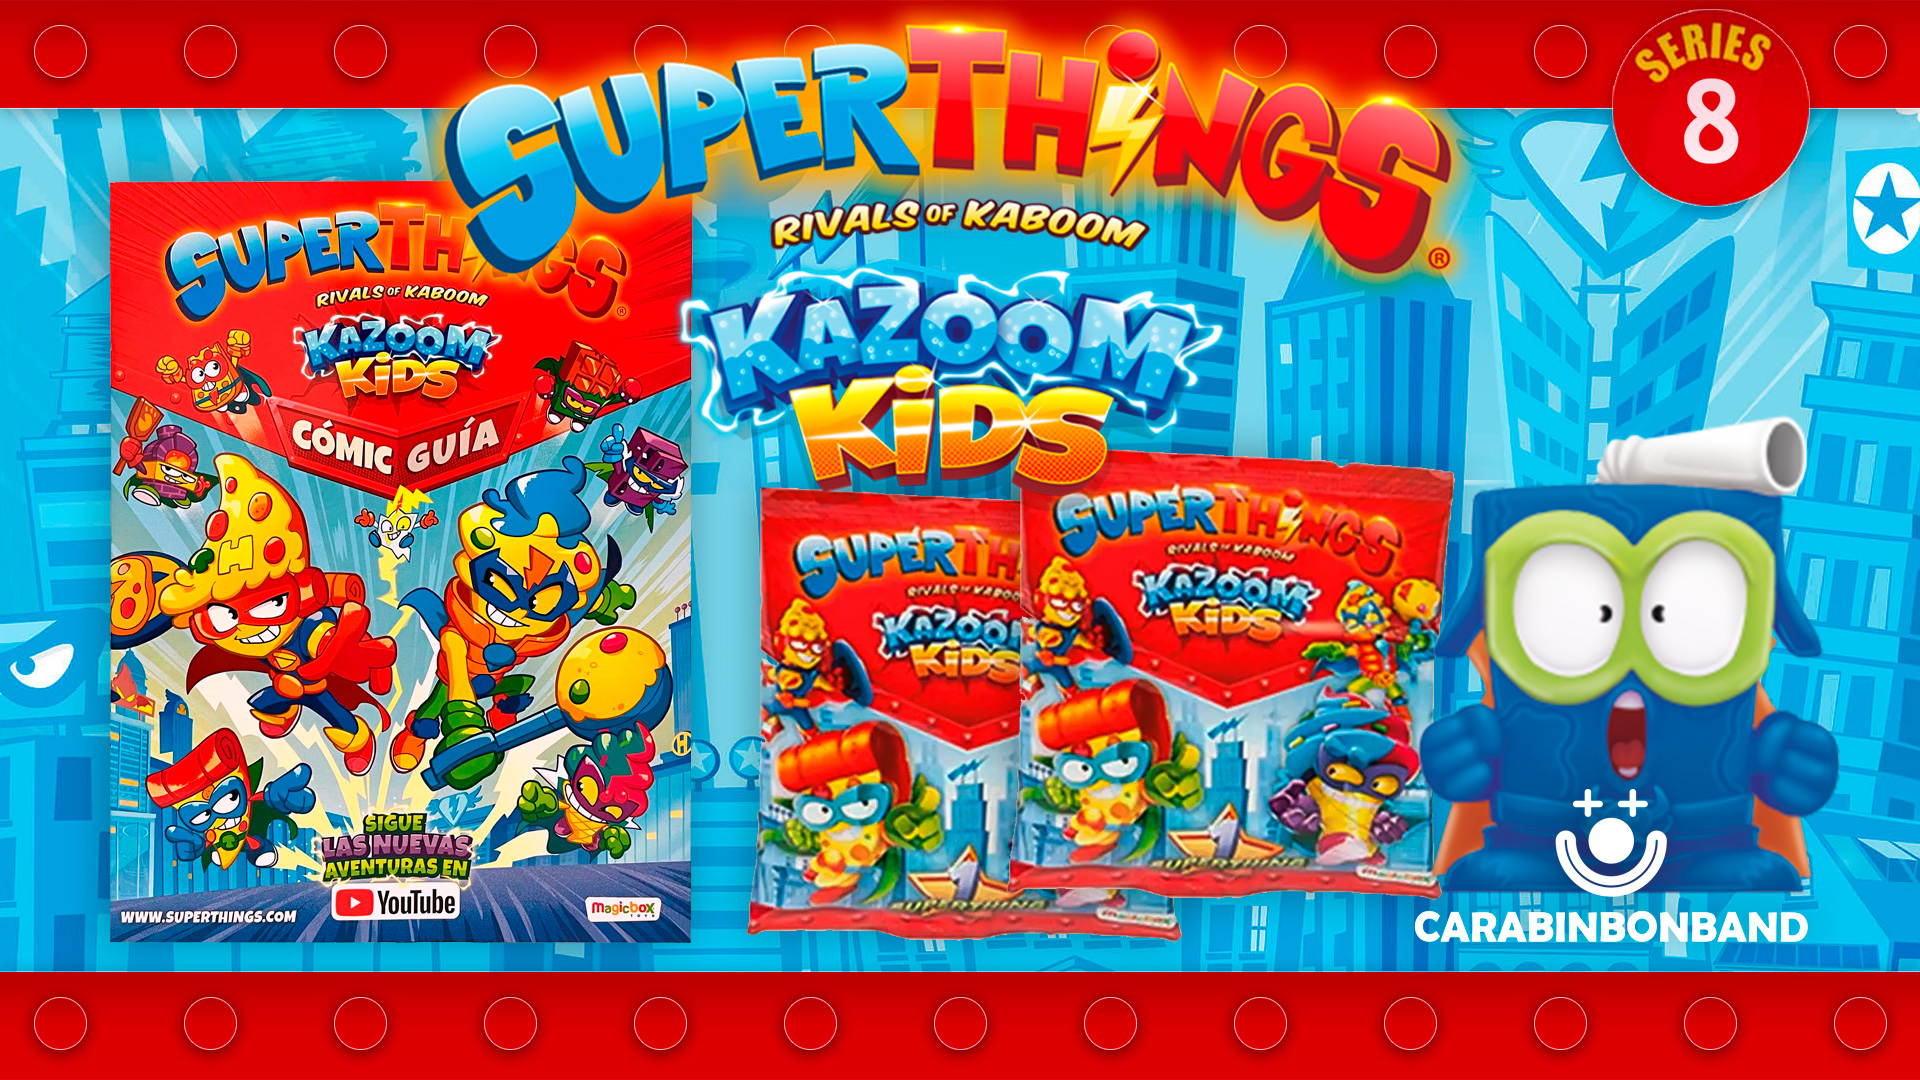 SUPERZINGS SERIES 8 COMIC GUIDE- SUPERTHINGS KAZOOM KIDS